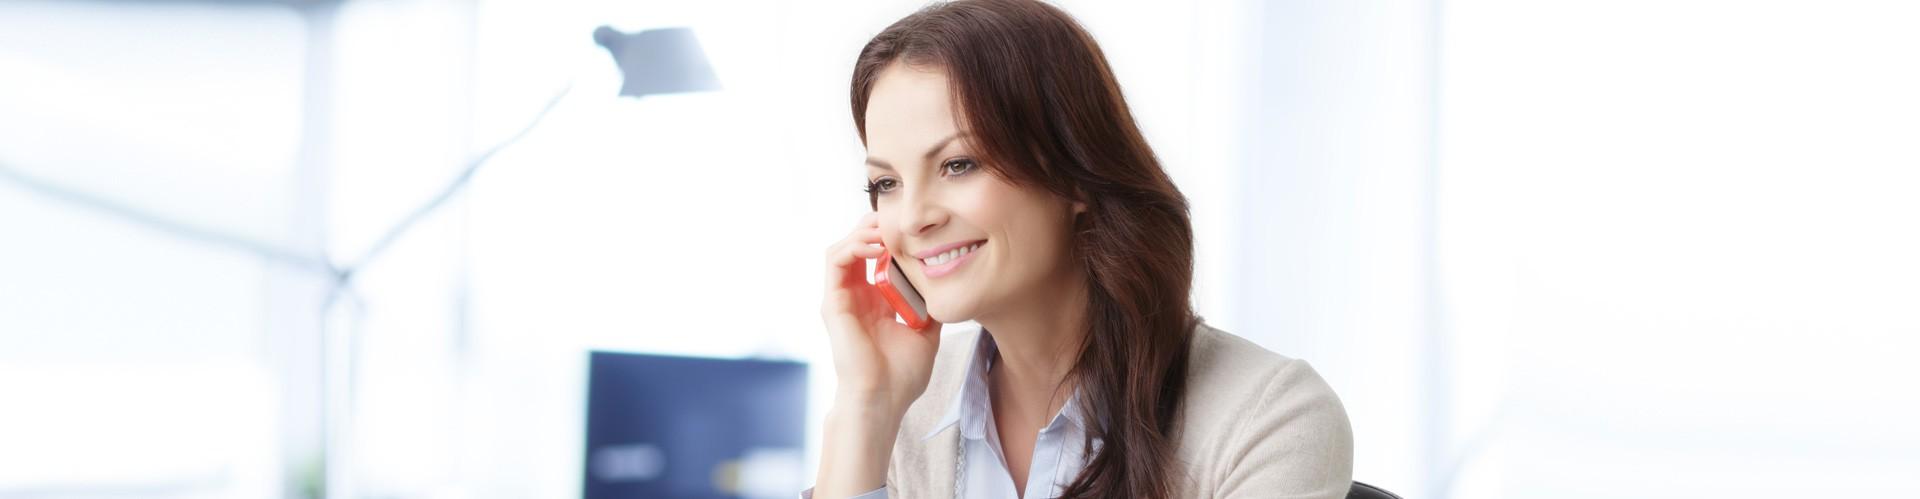 Frau telefoniert mit Handy